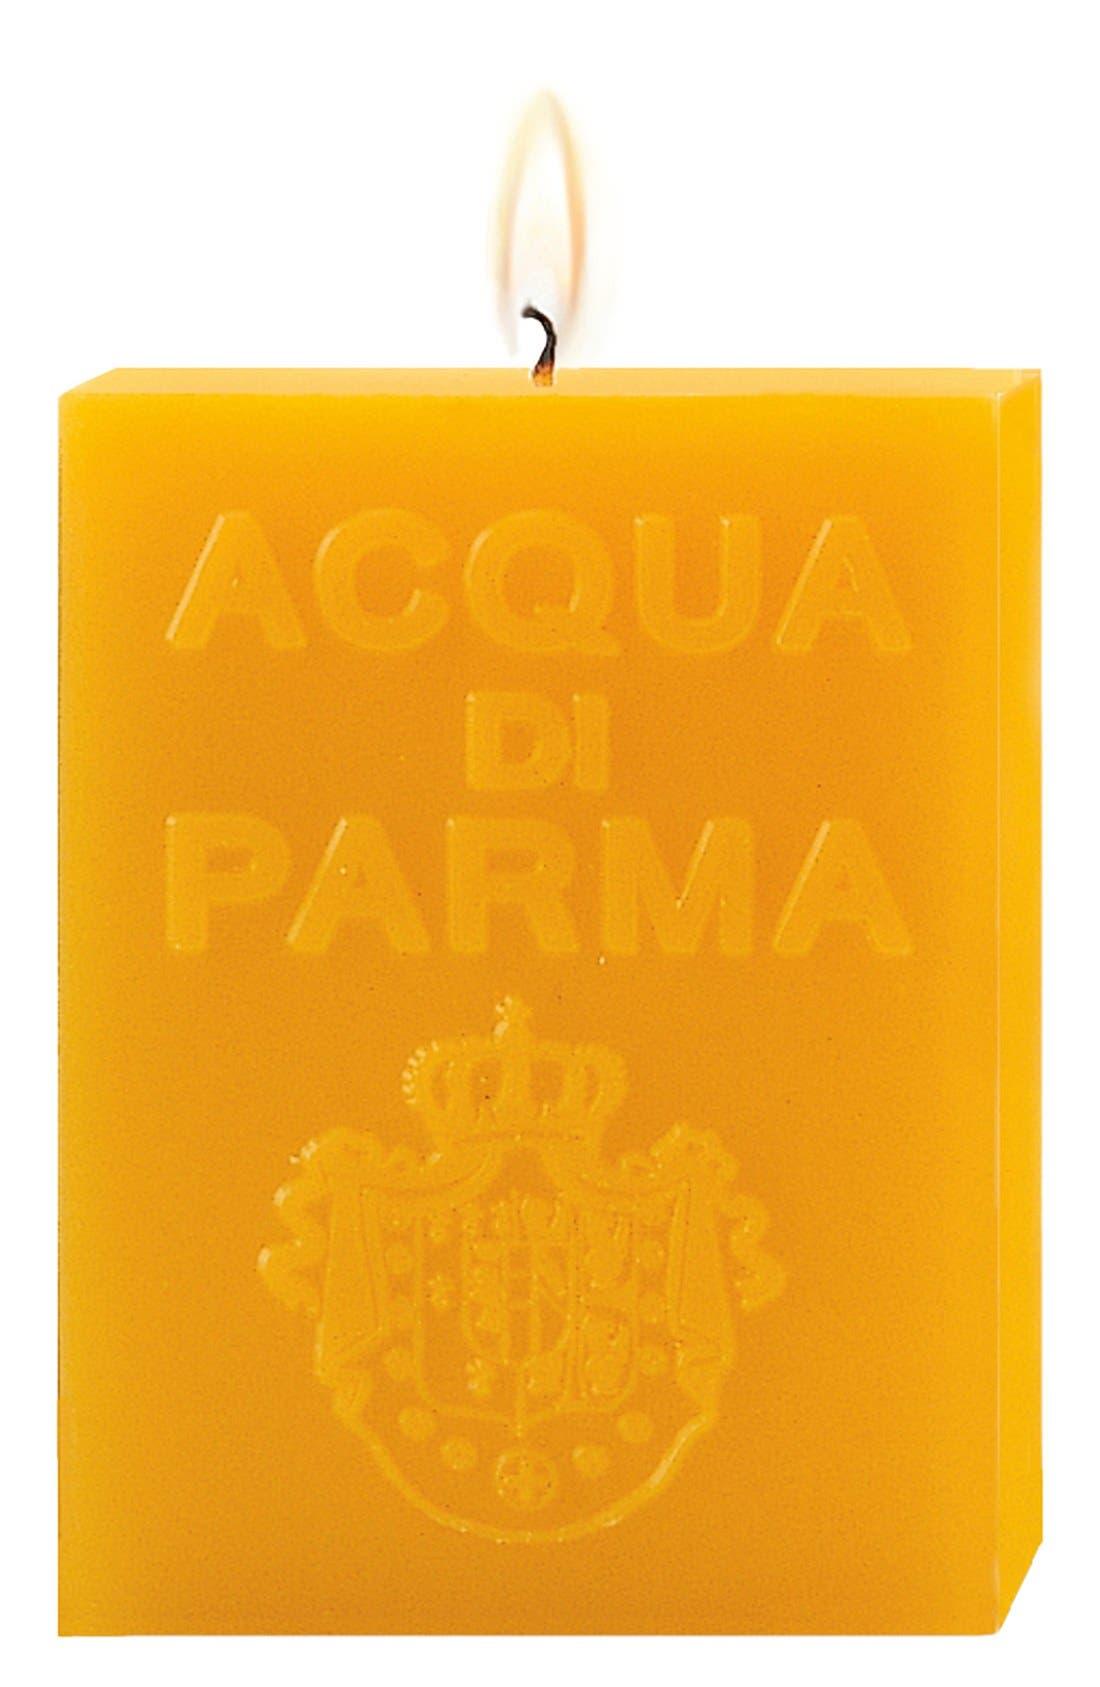 Alternate Image 1 Selected - Acqua di Parma 'Yellow Colonia' Cube Candle